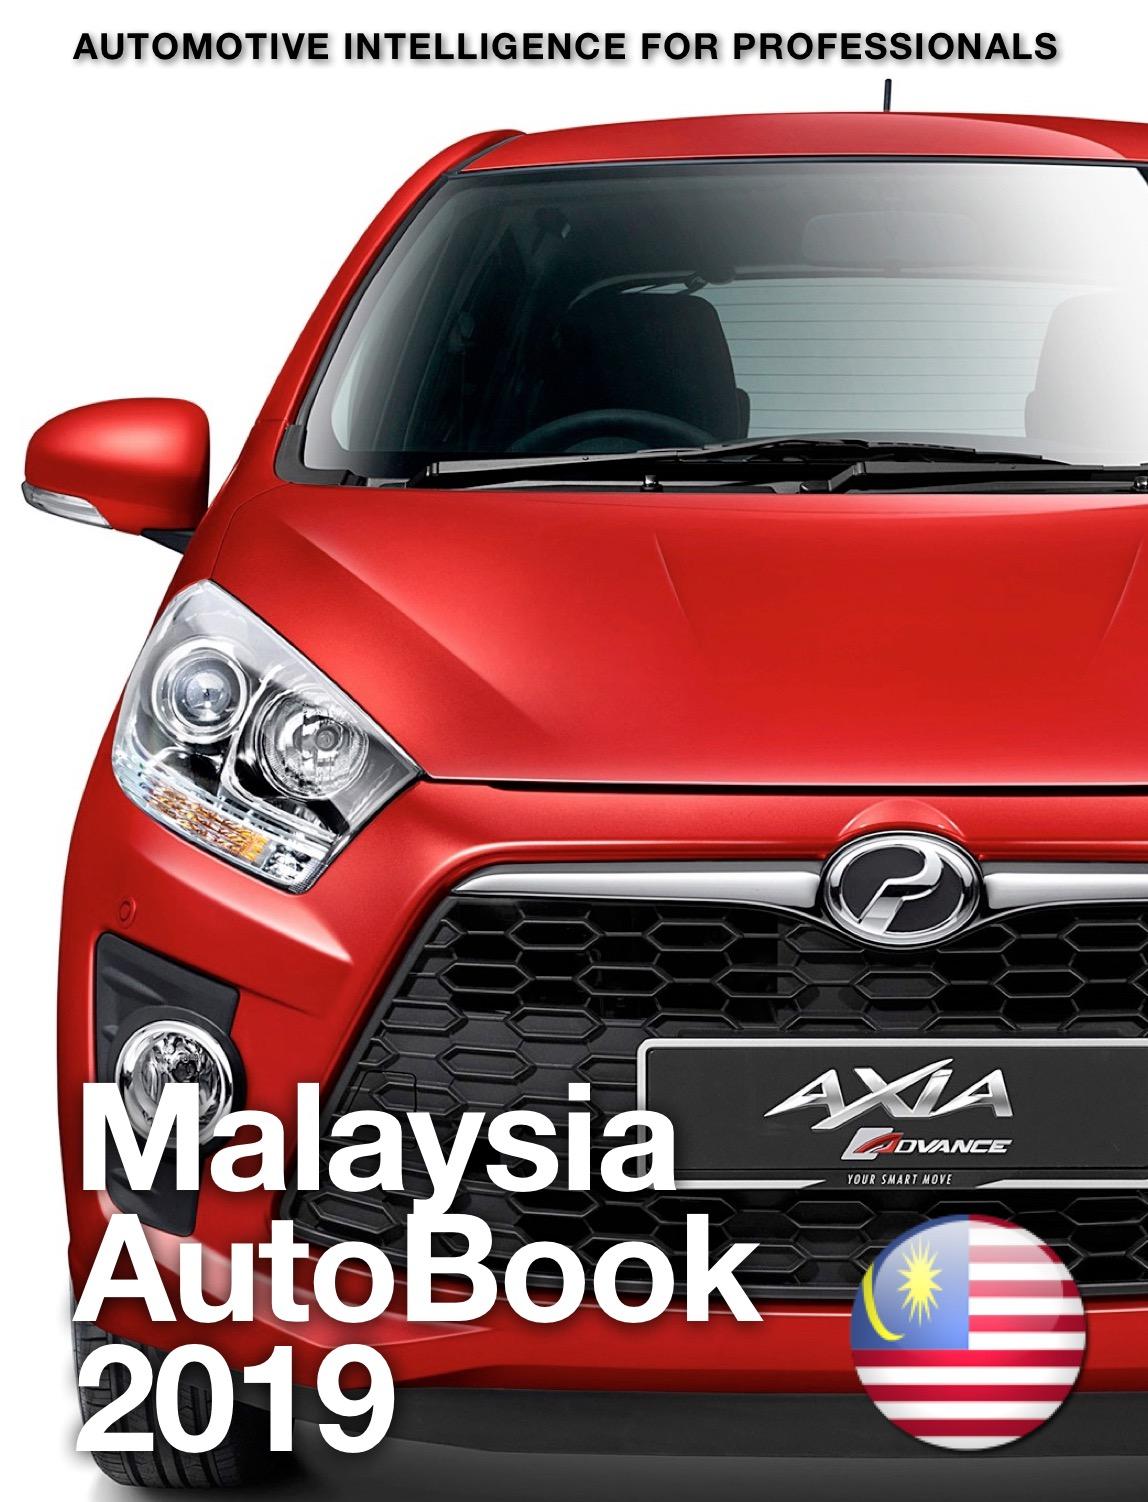 Malaysia AutoBook 2018 1027x1340.jpg